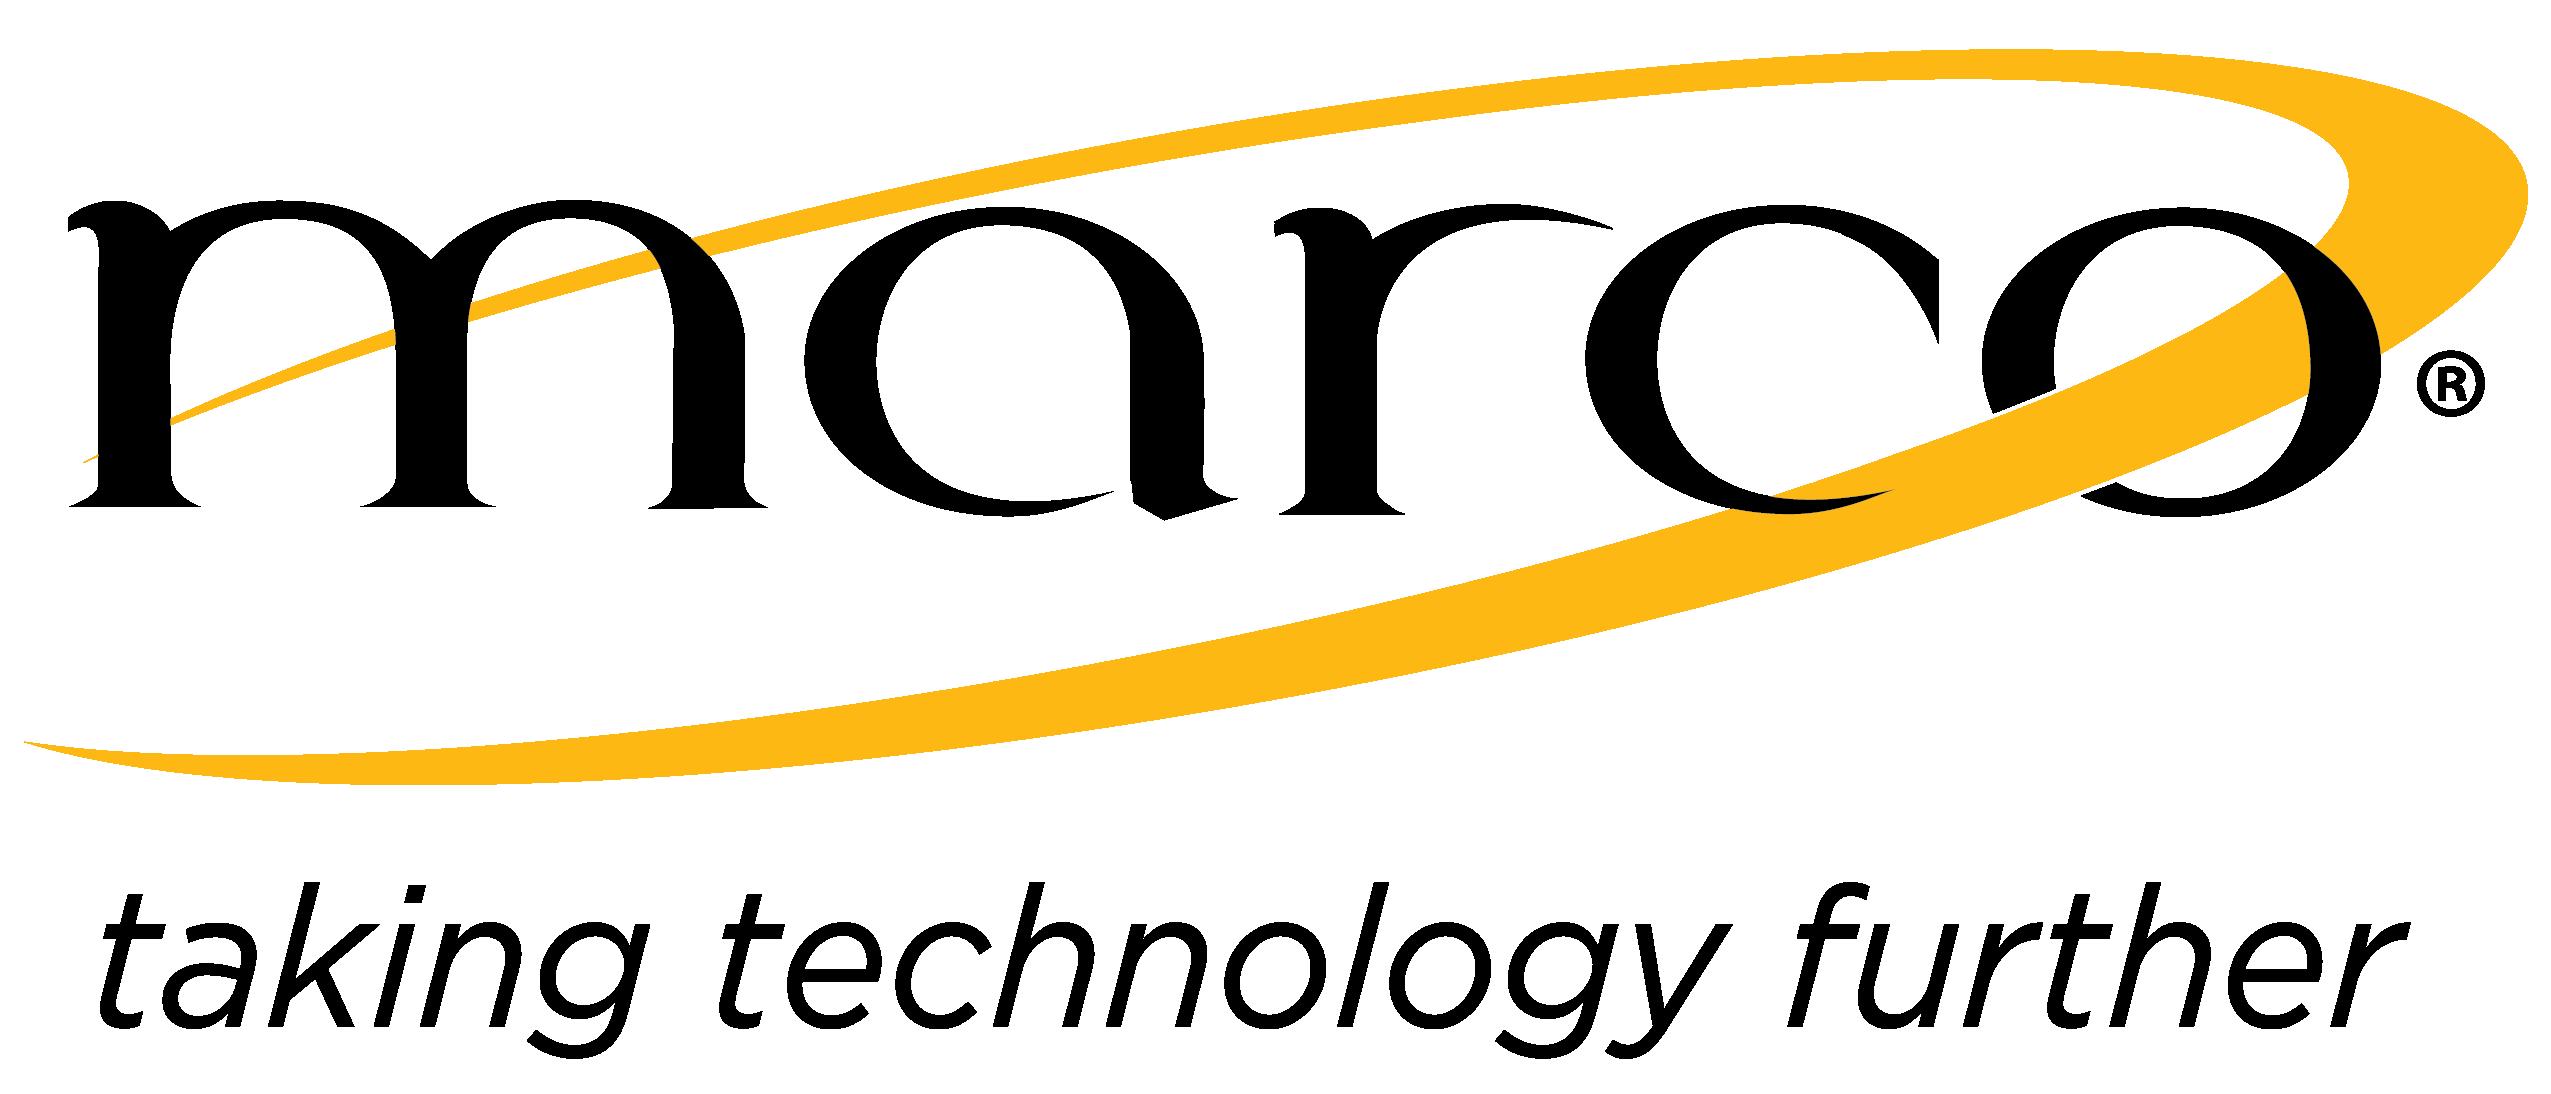 Marco Technologies